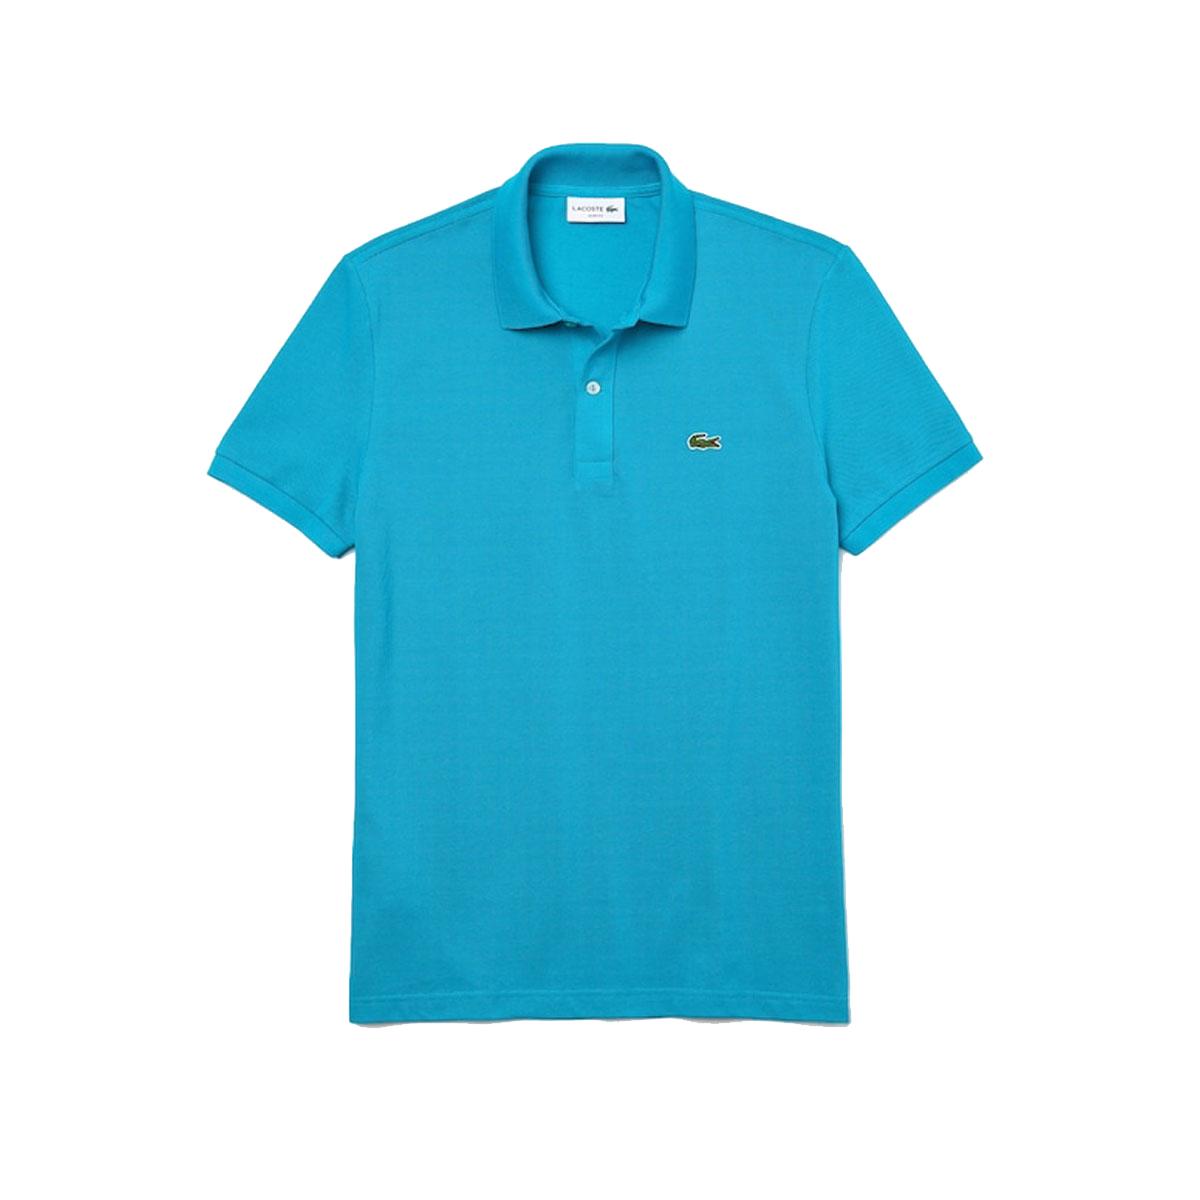 Lacoste Slim Fit Polo PH4012-HDB Blauw maat